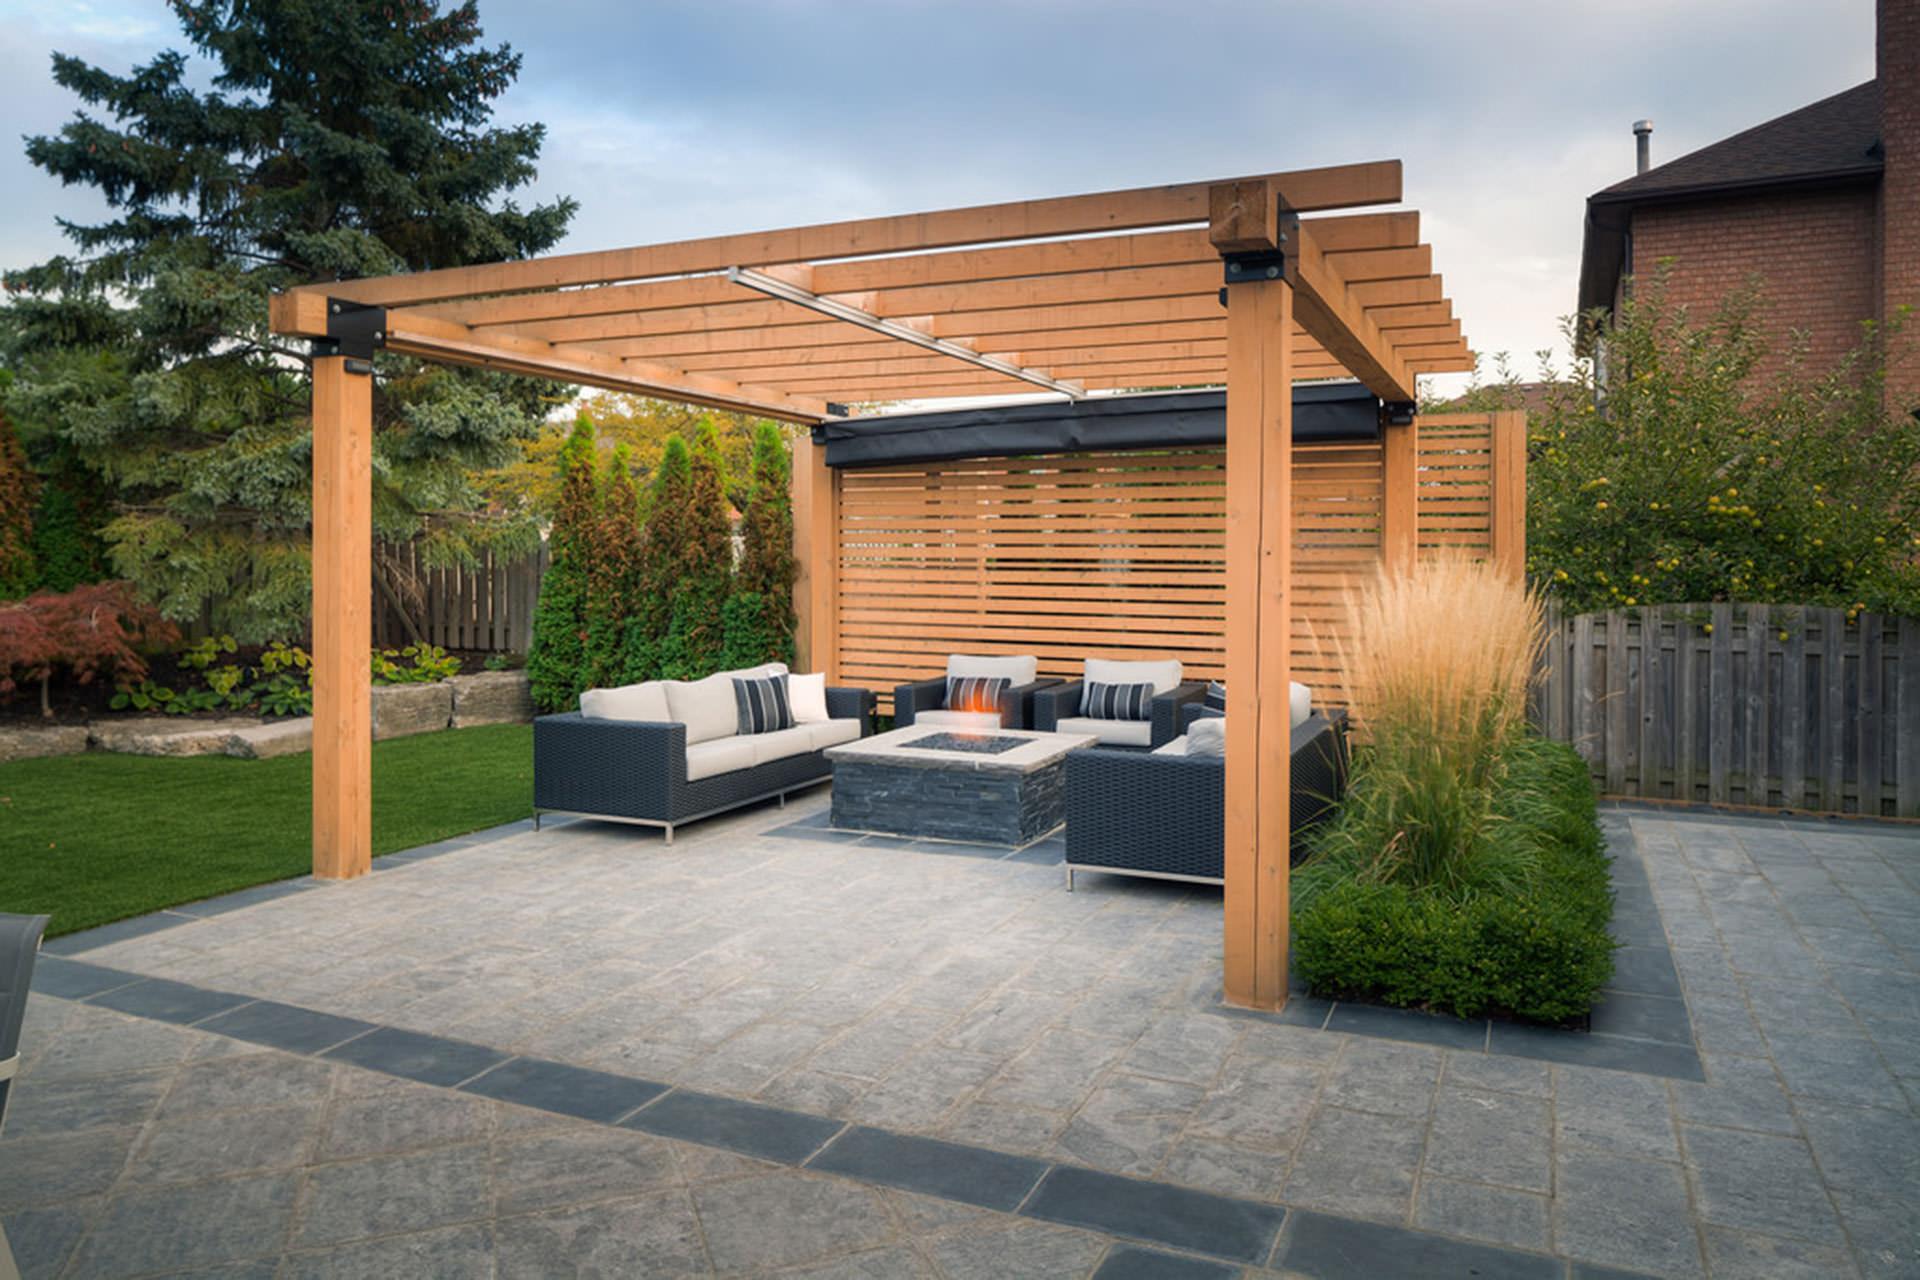 pergola garden structures - Garden Structures